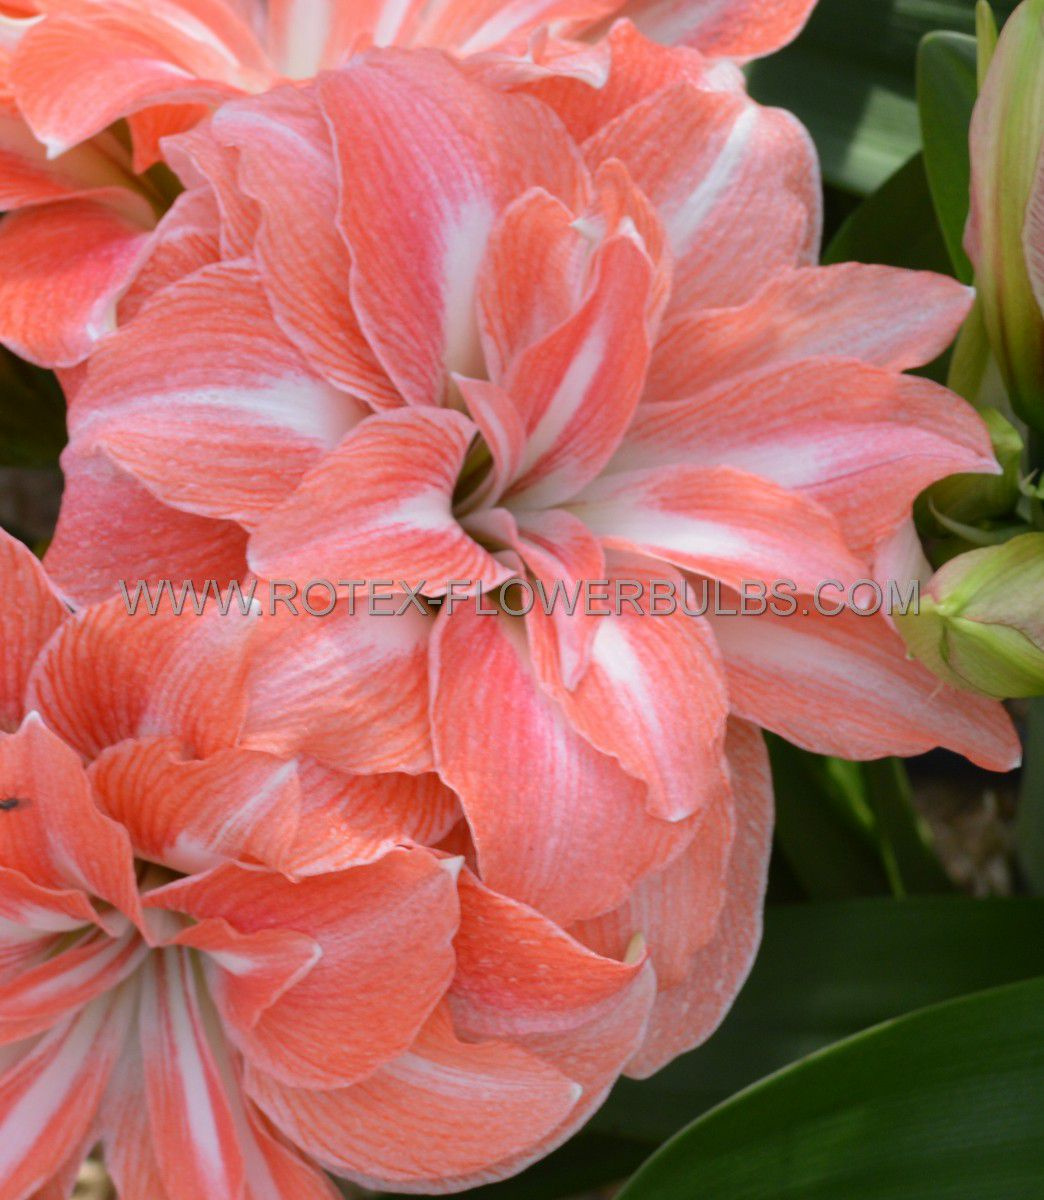 hippeastrum amaryllis double flowering lady jane 3436 cm 6 popen top box